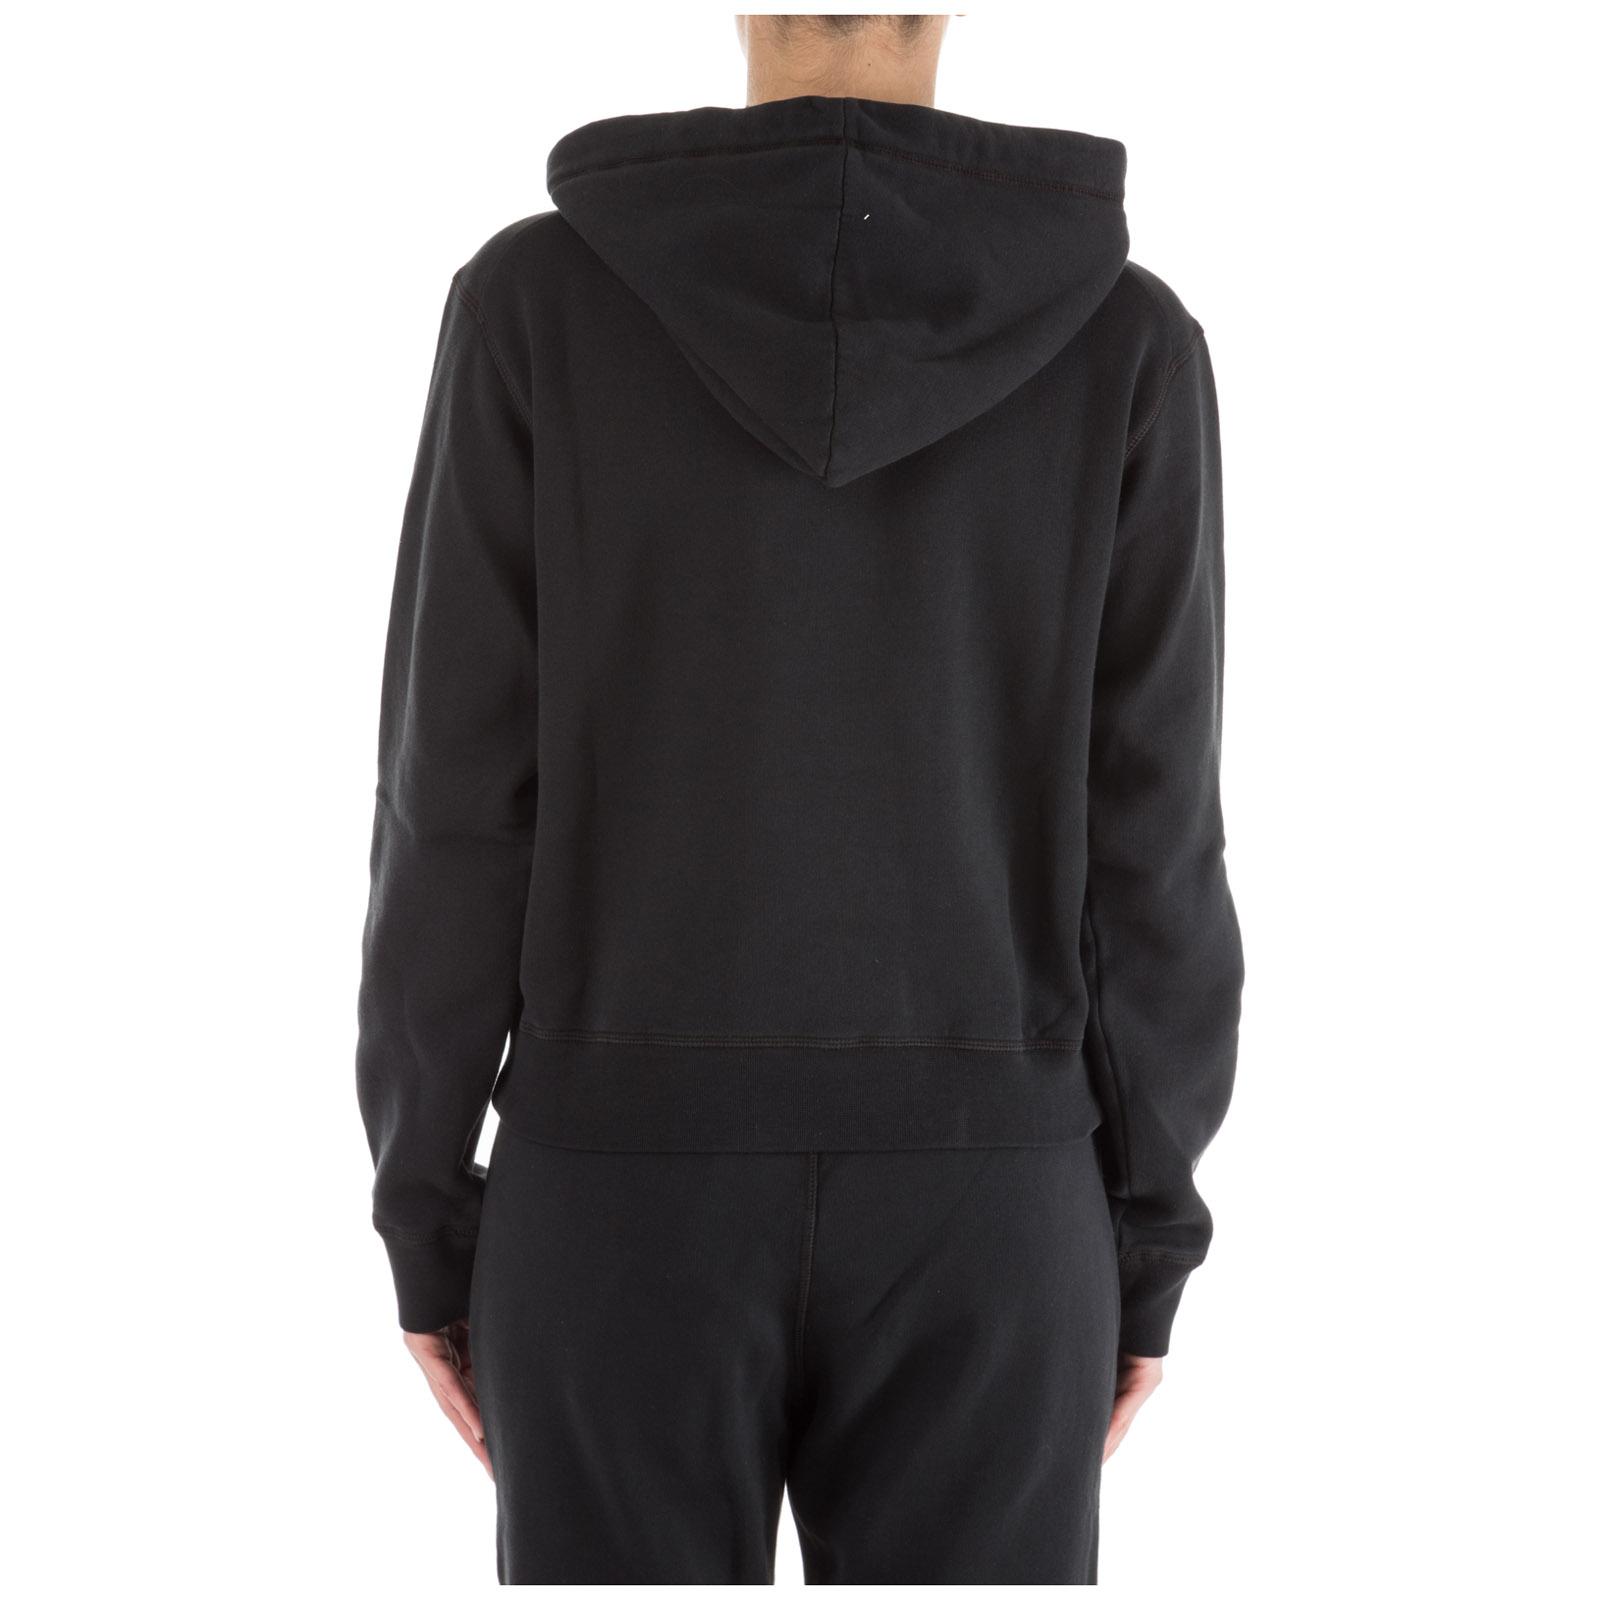 Women's sweatshirt hood hoodie logo